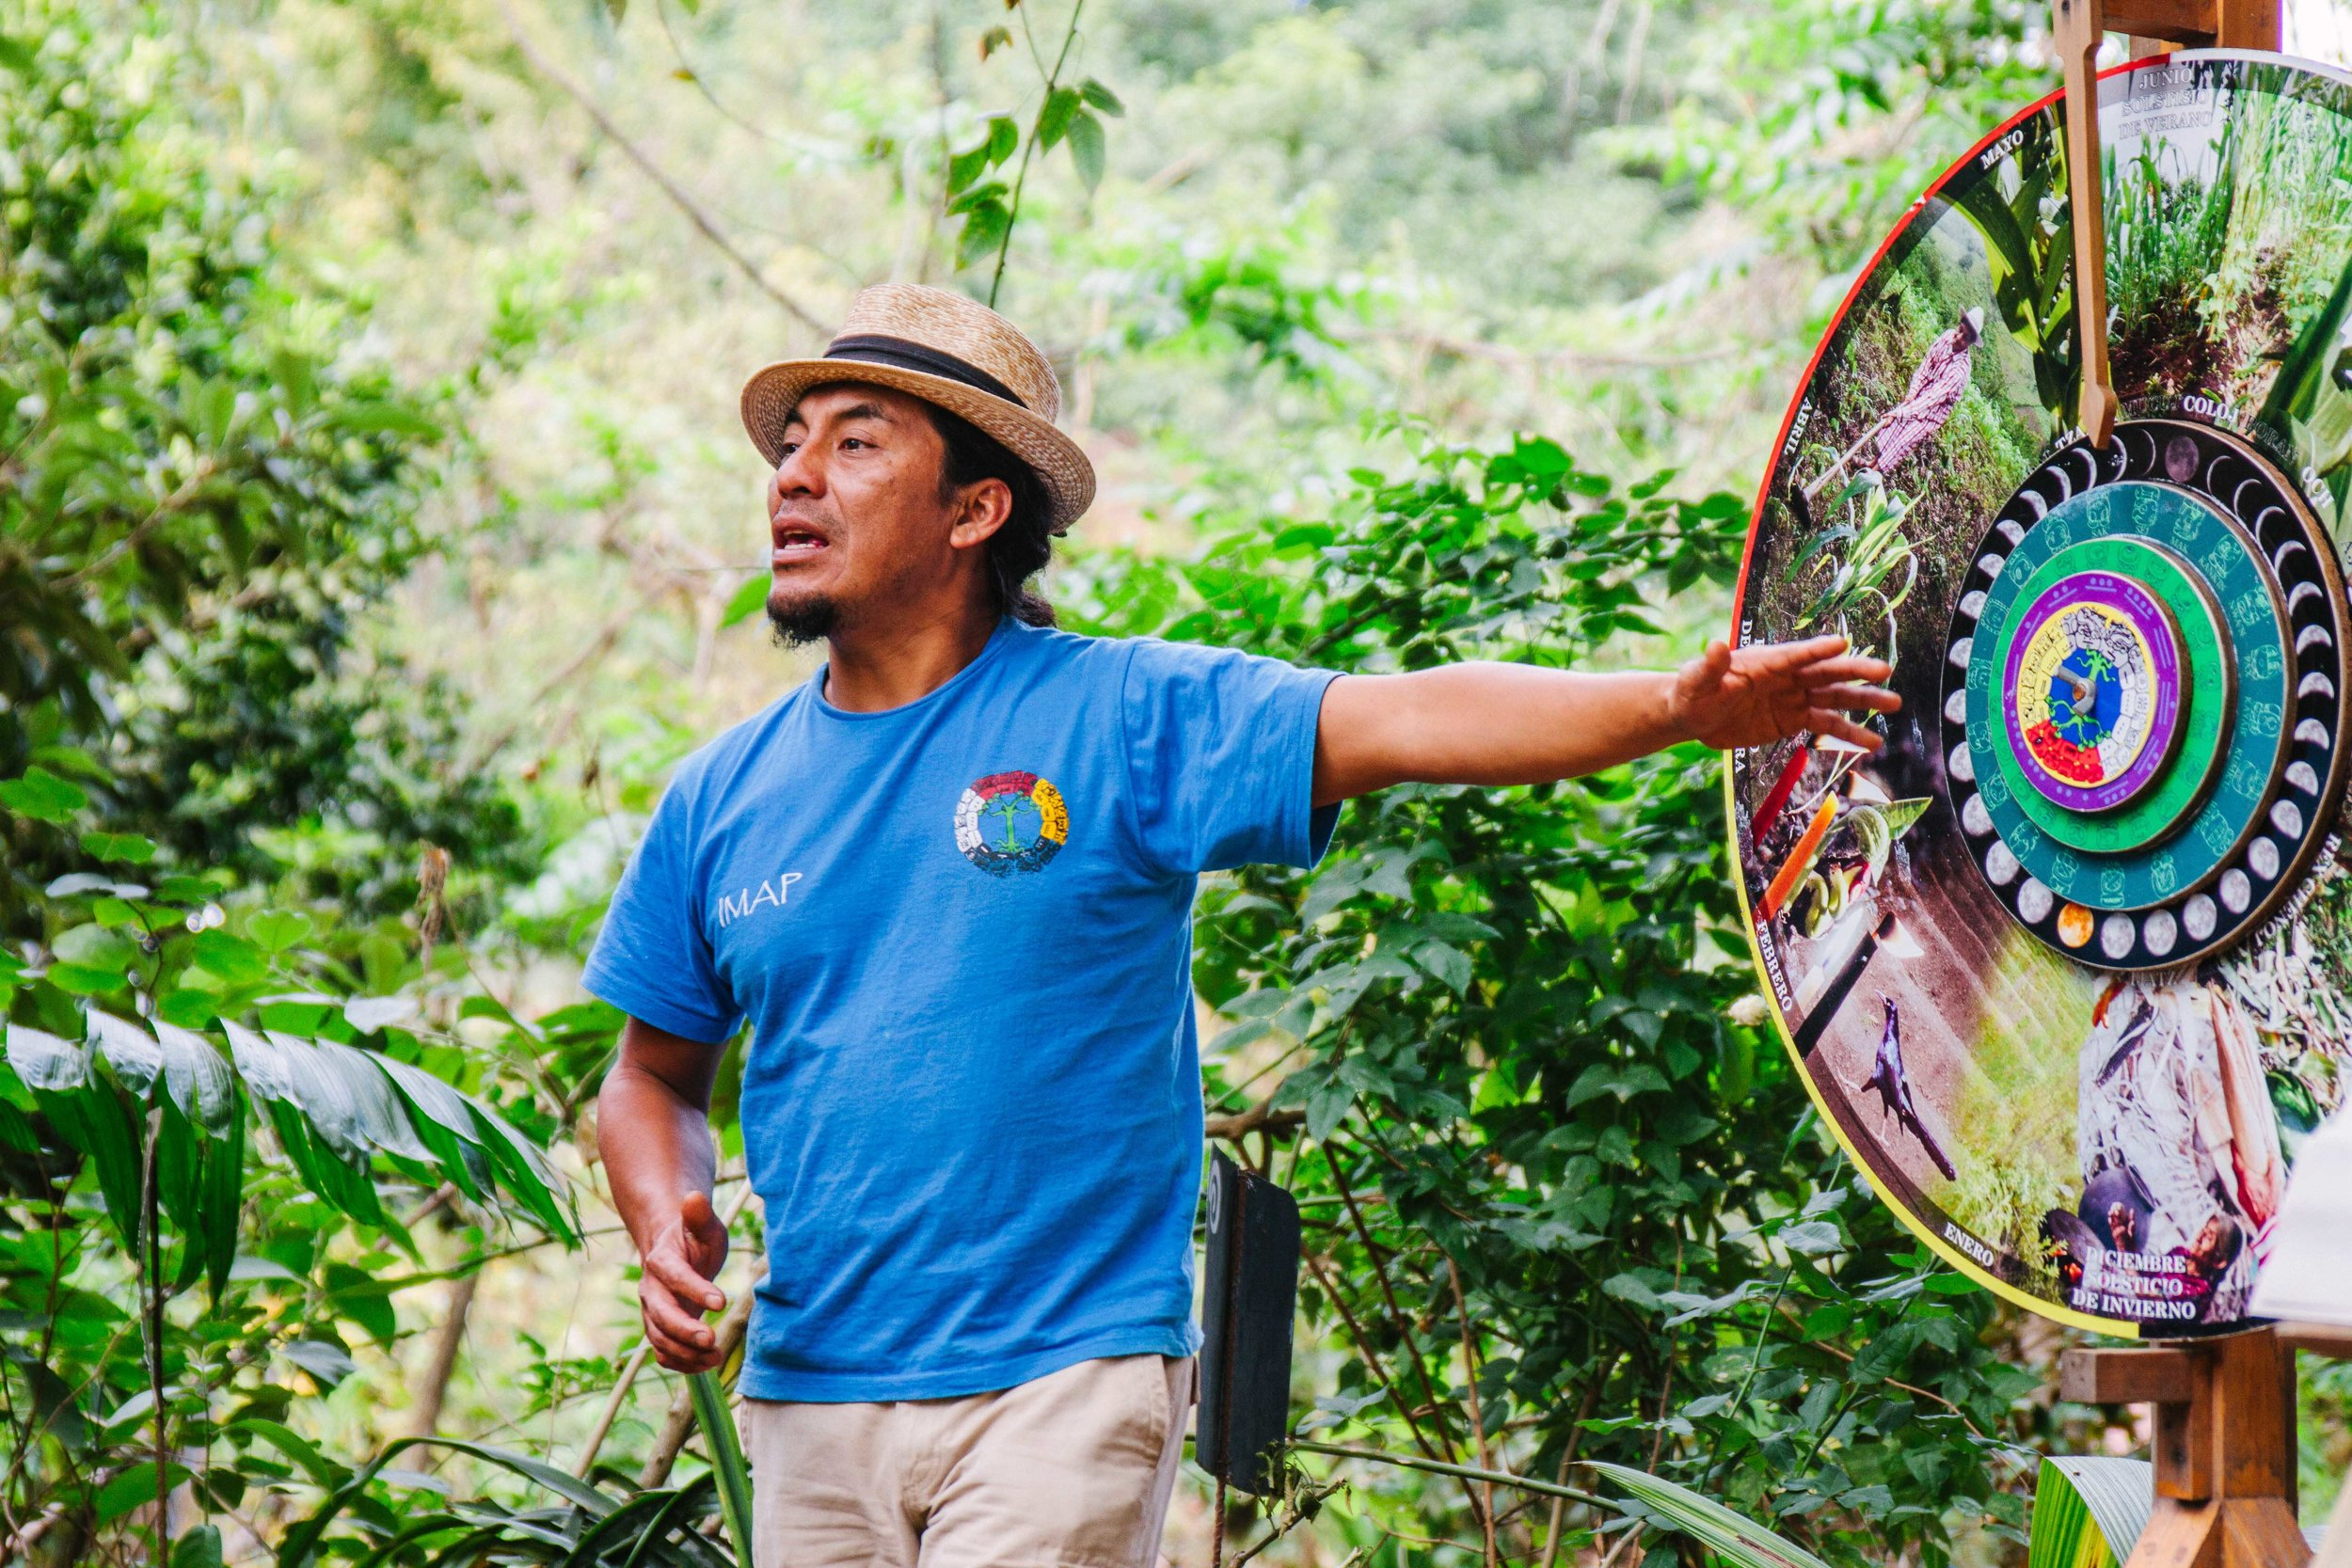 Rony Lec,Permaculture Design Certification Course, PDC, sustainability, regenerative agriculture, Permaculture, Lake Atitlan, Tzununa, Guatemala, Central America